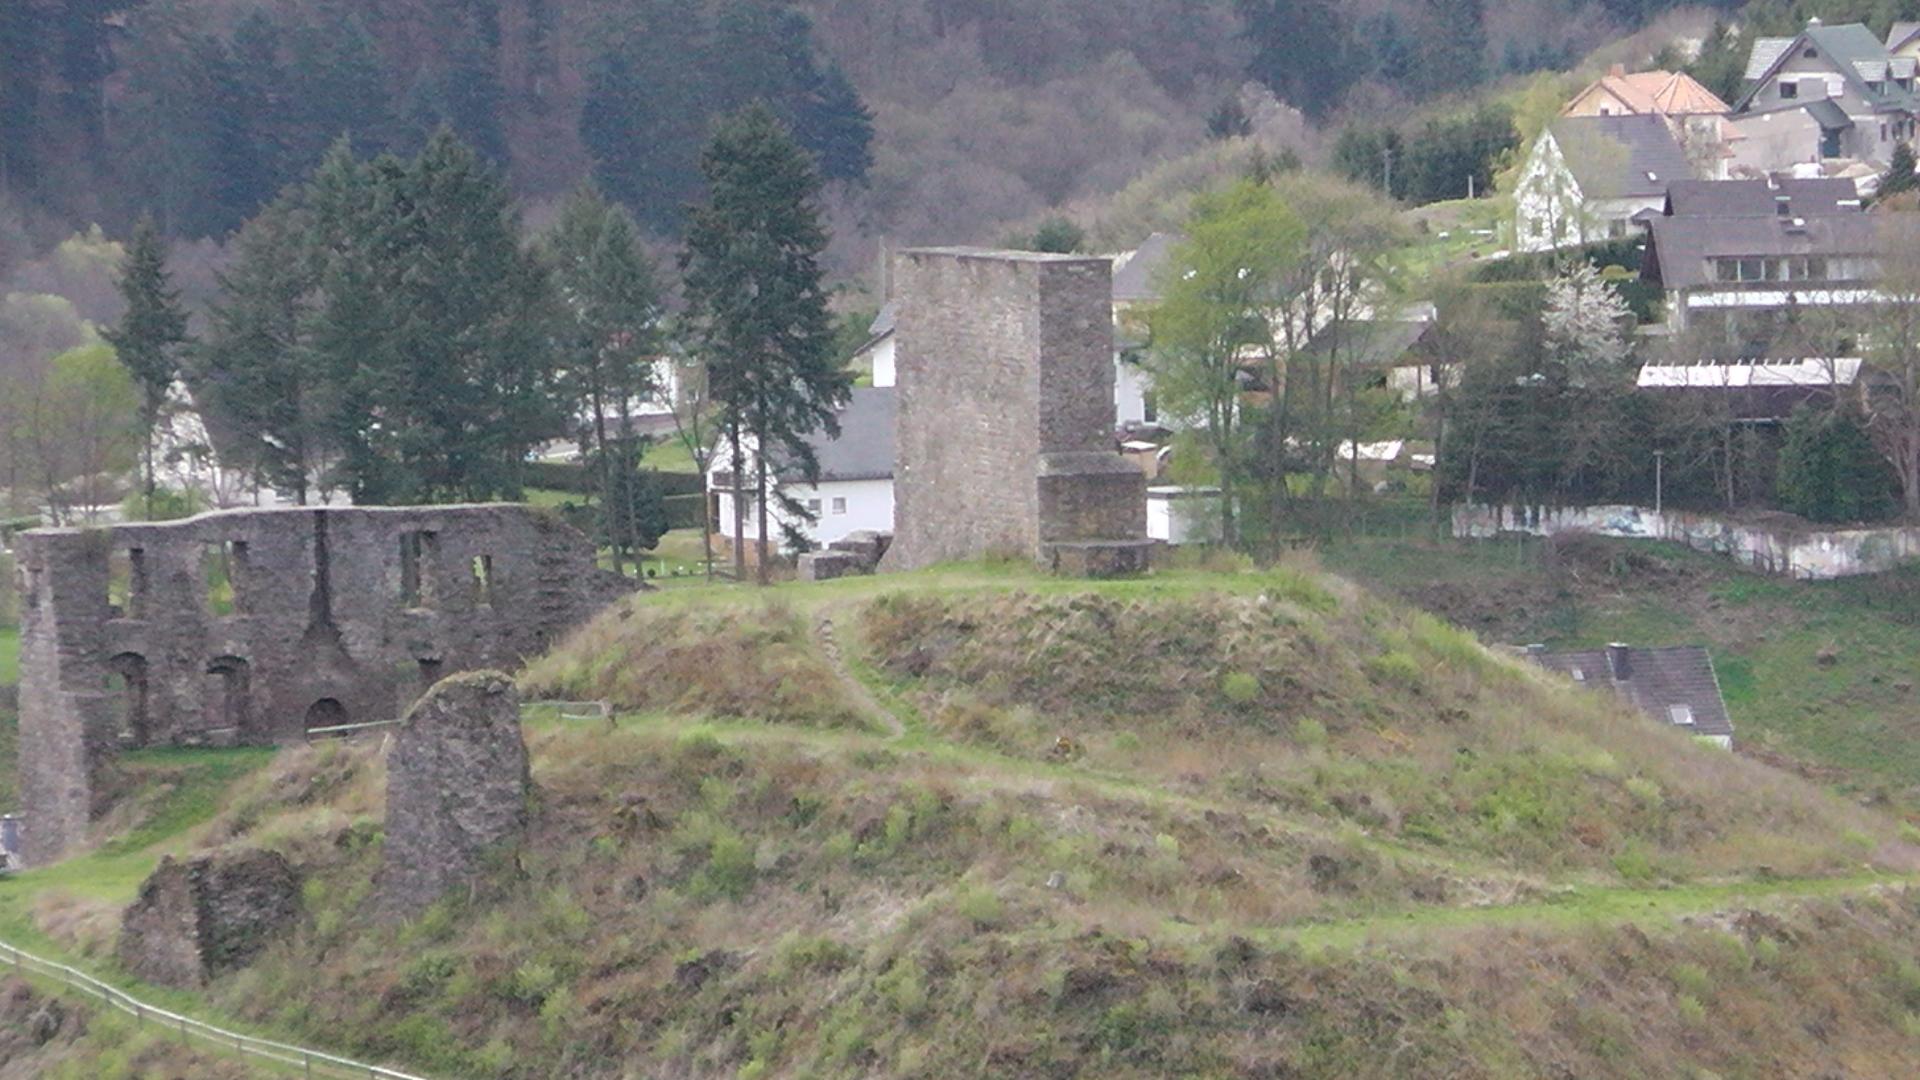 66-blick-auf-die-ruine-virneburg